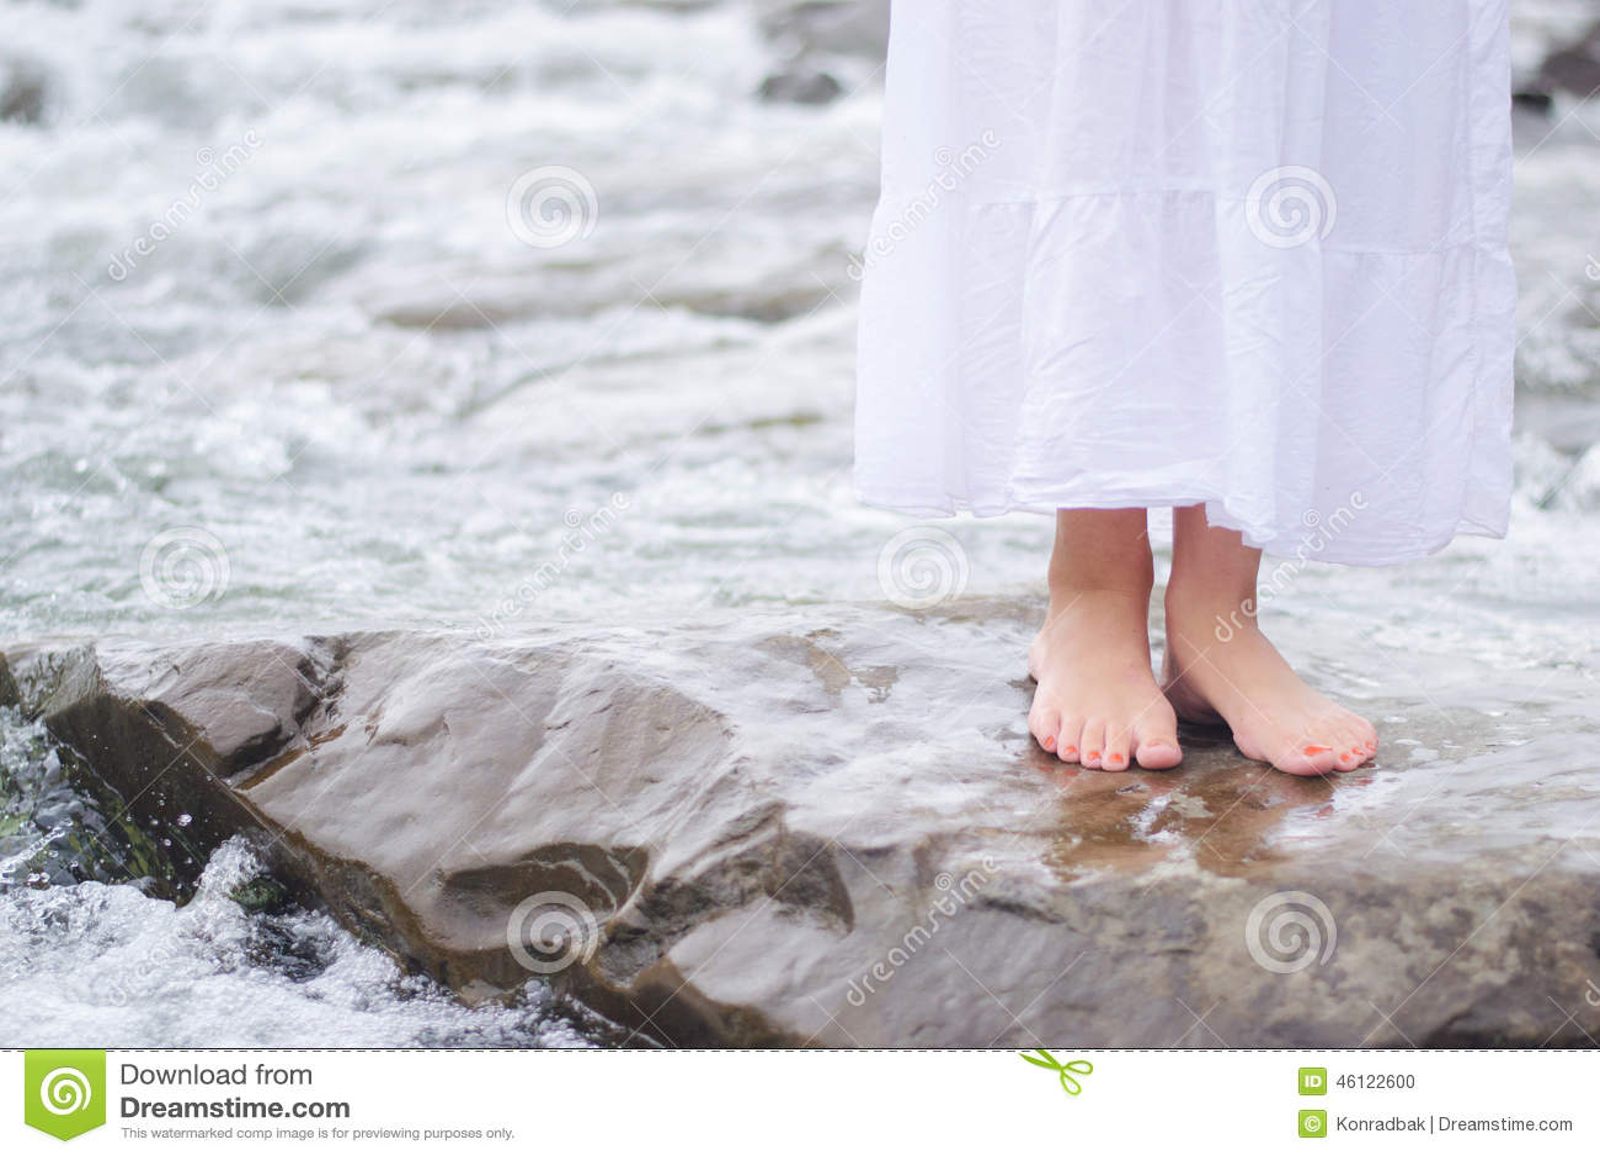 Streaming foot